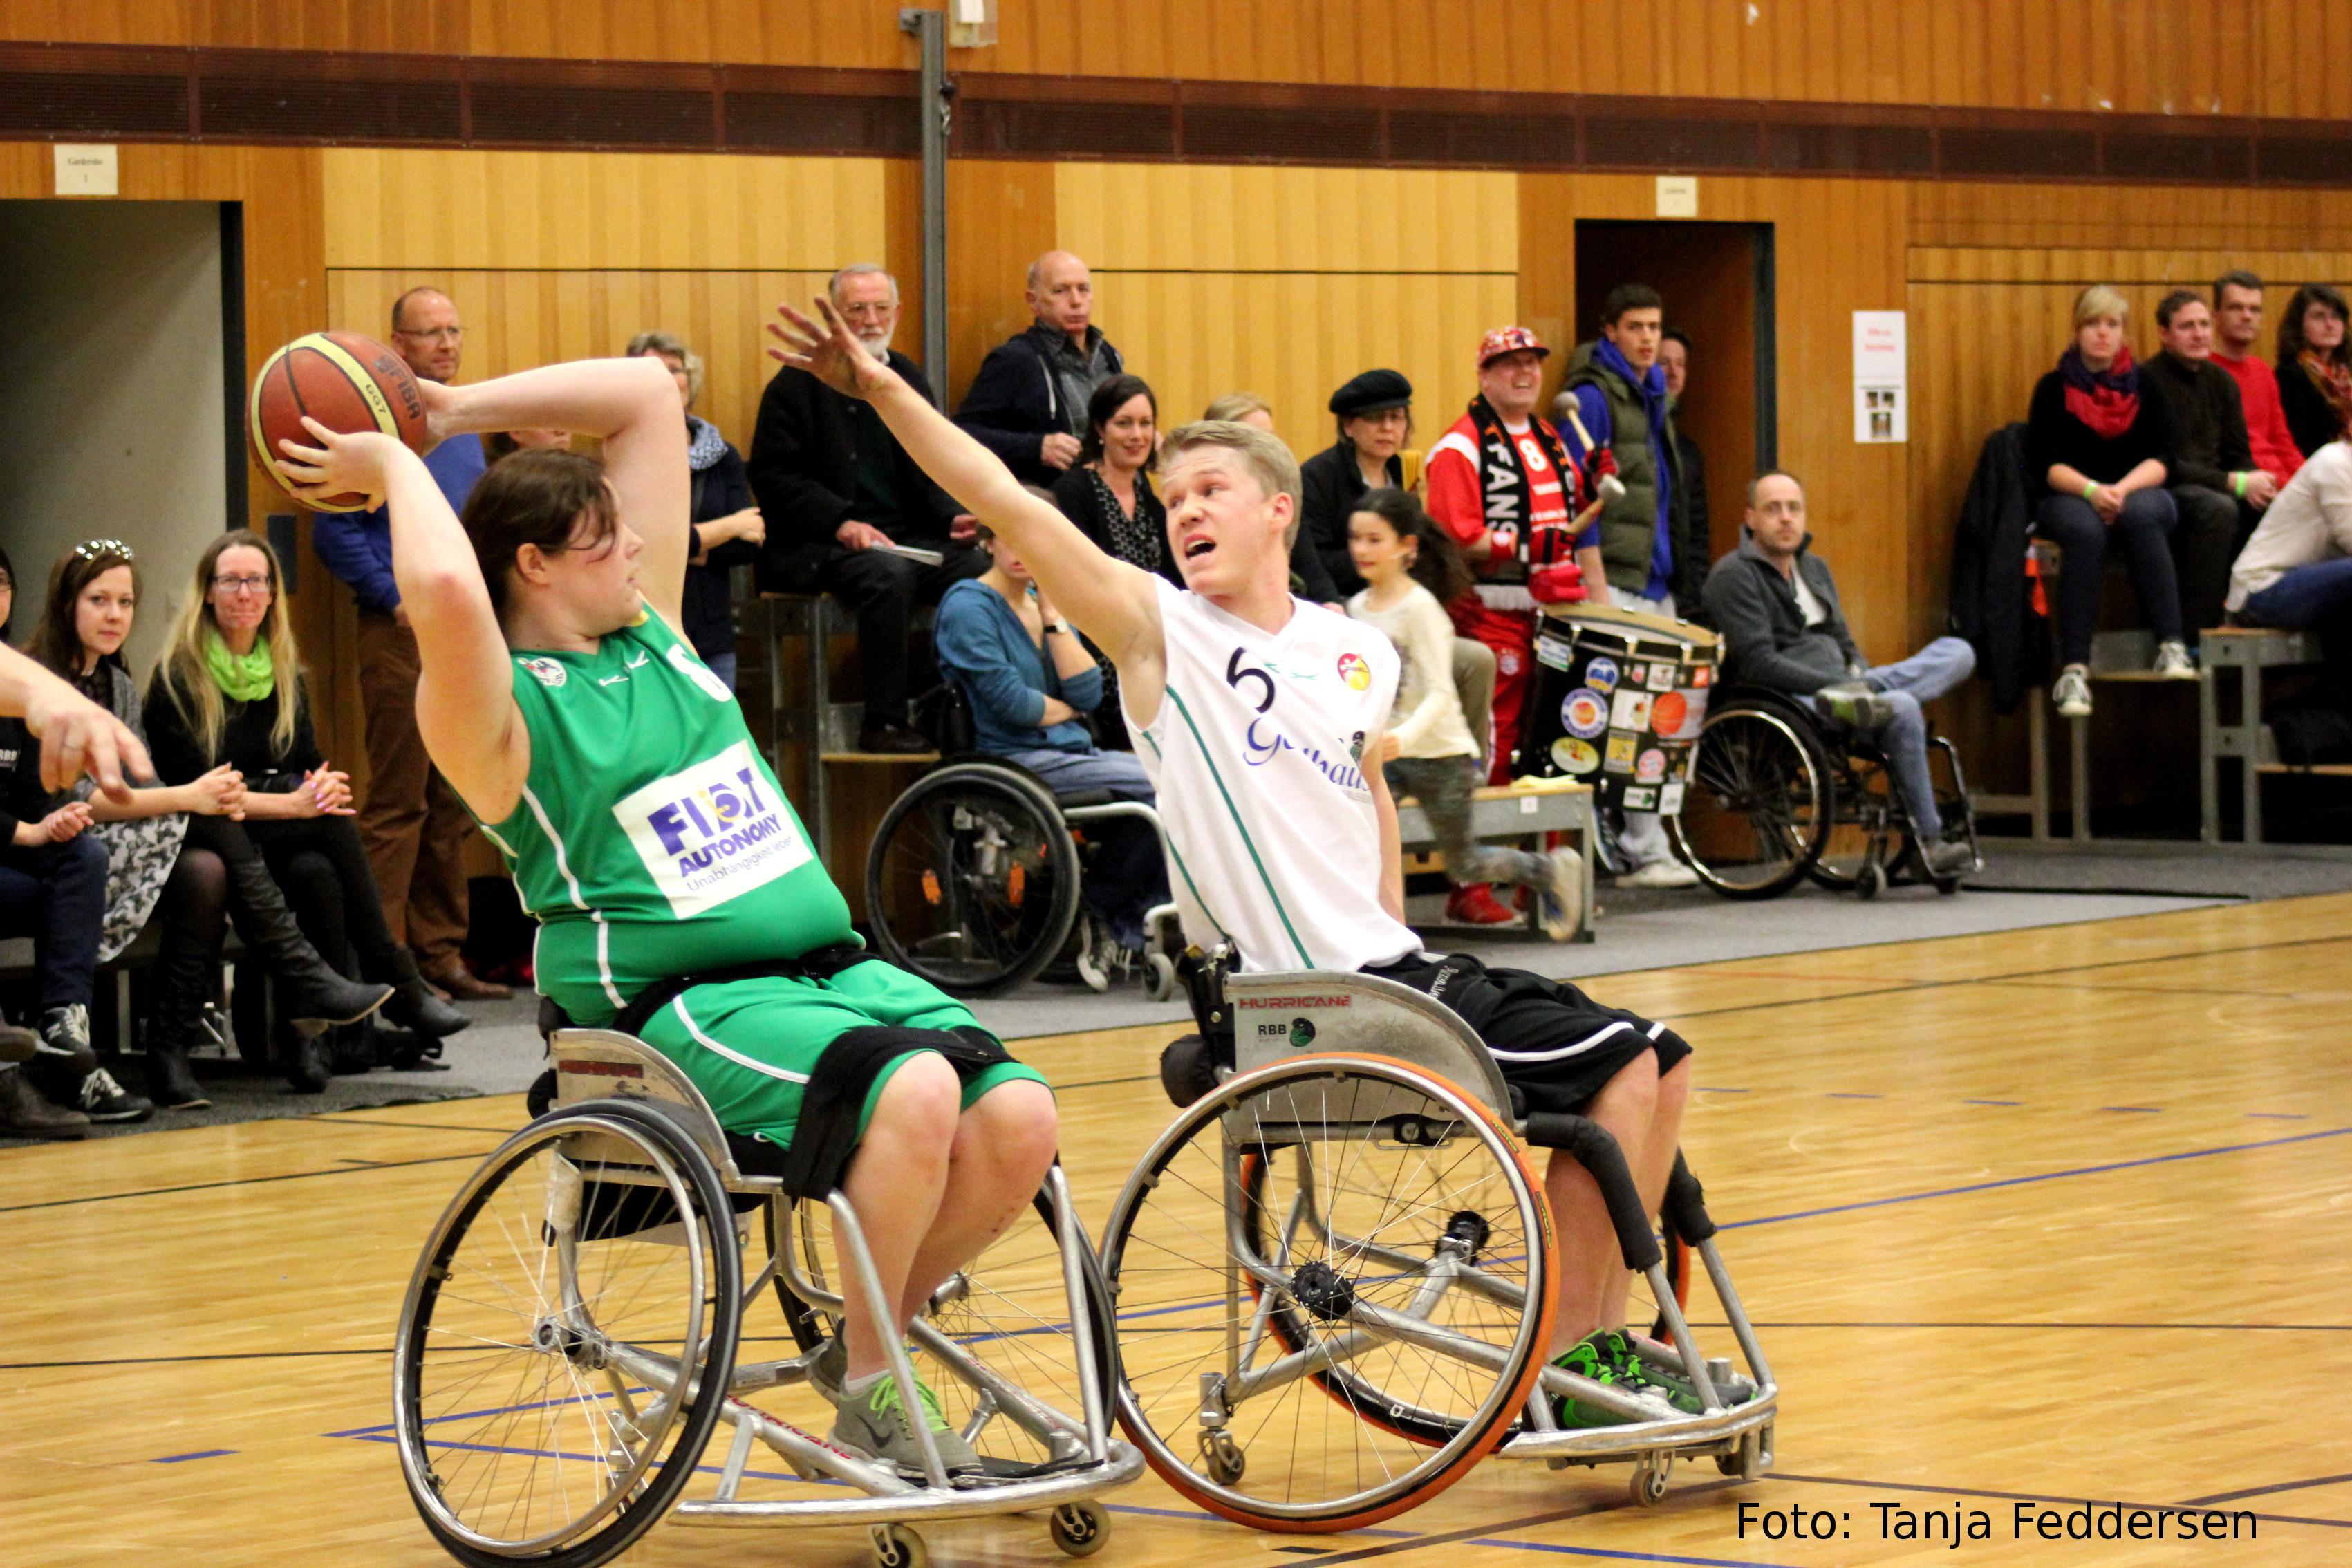 DRS-Pokal – Final Four Halbfinal-Paarungen stehen fest